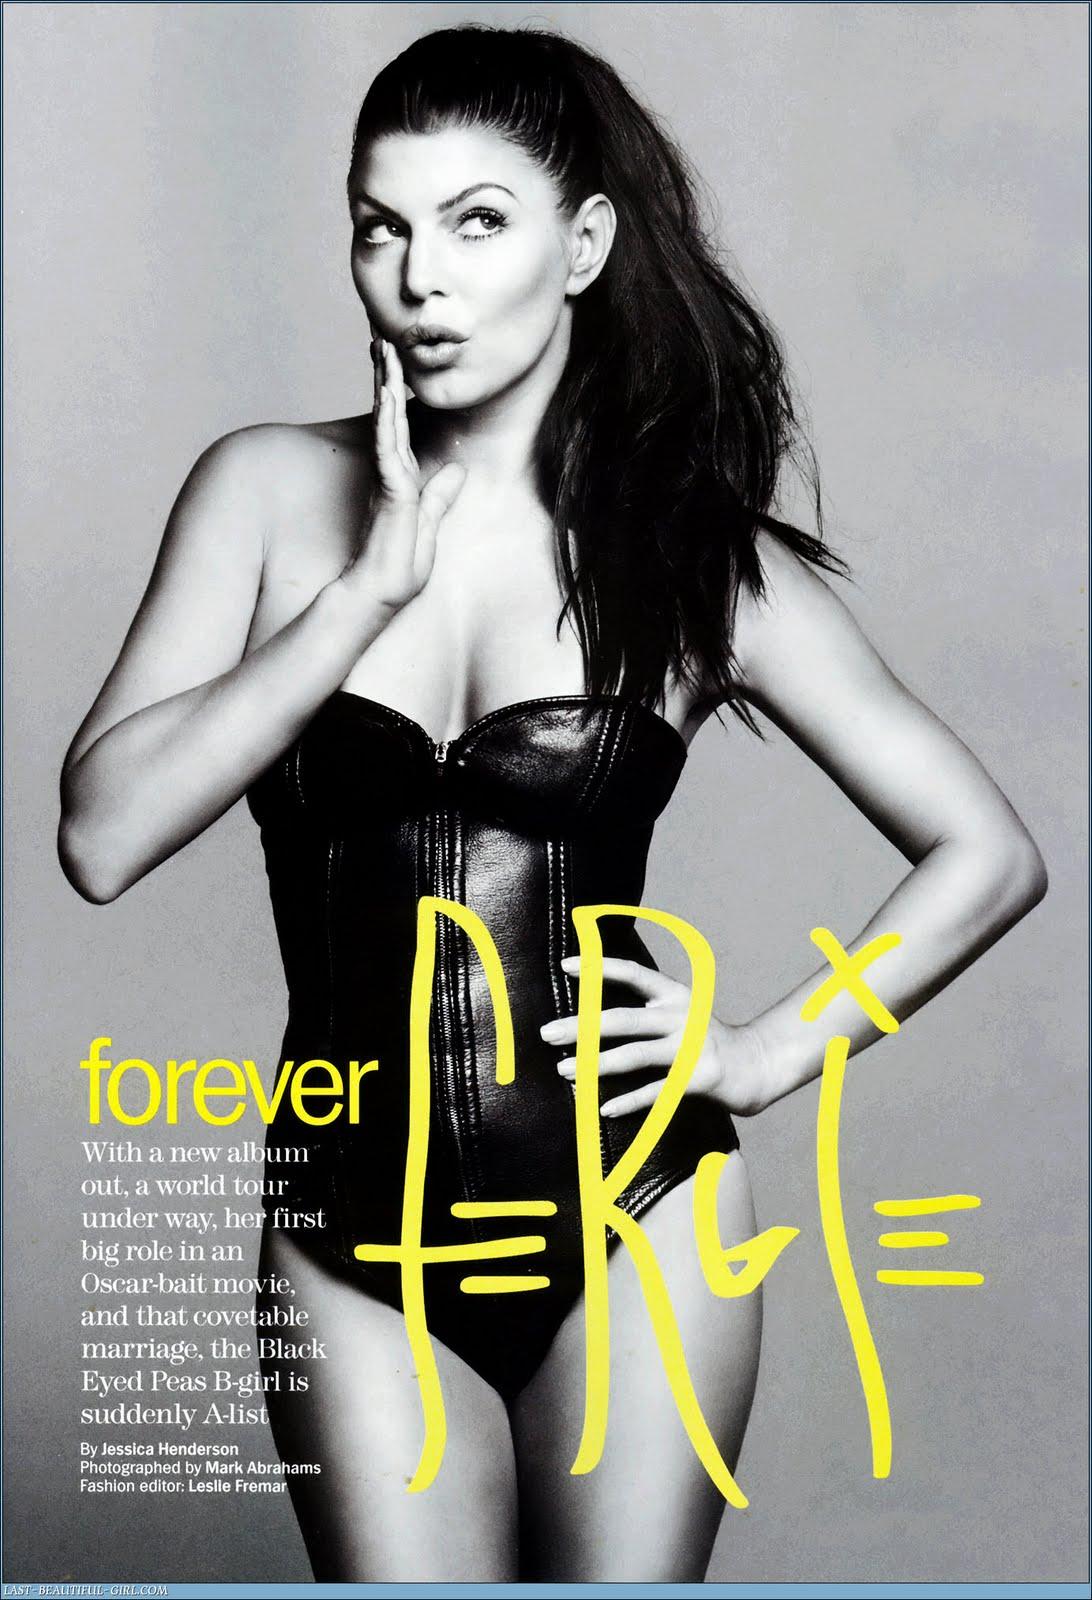 http://3.bp.blogspot.com/-XRLAahSdJiU/TimrjCRz6VI/AAAAAAAAAfc/sVbiwGfoJxY/s1600/fergie-leather-corset.jpg